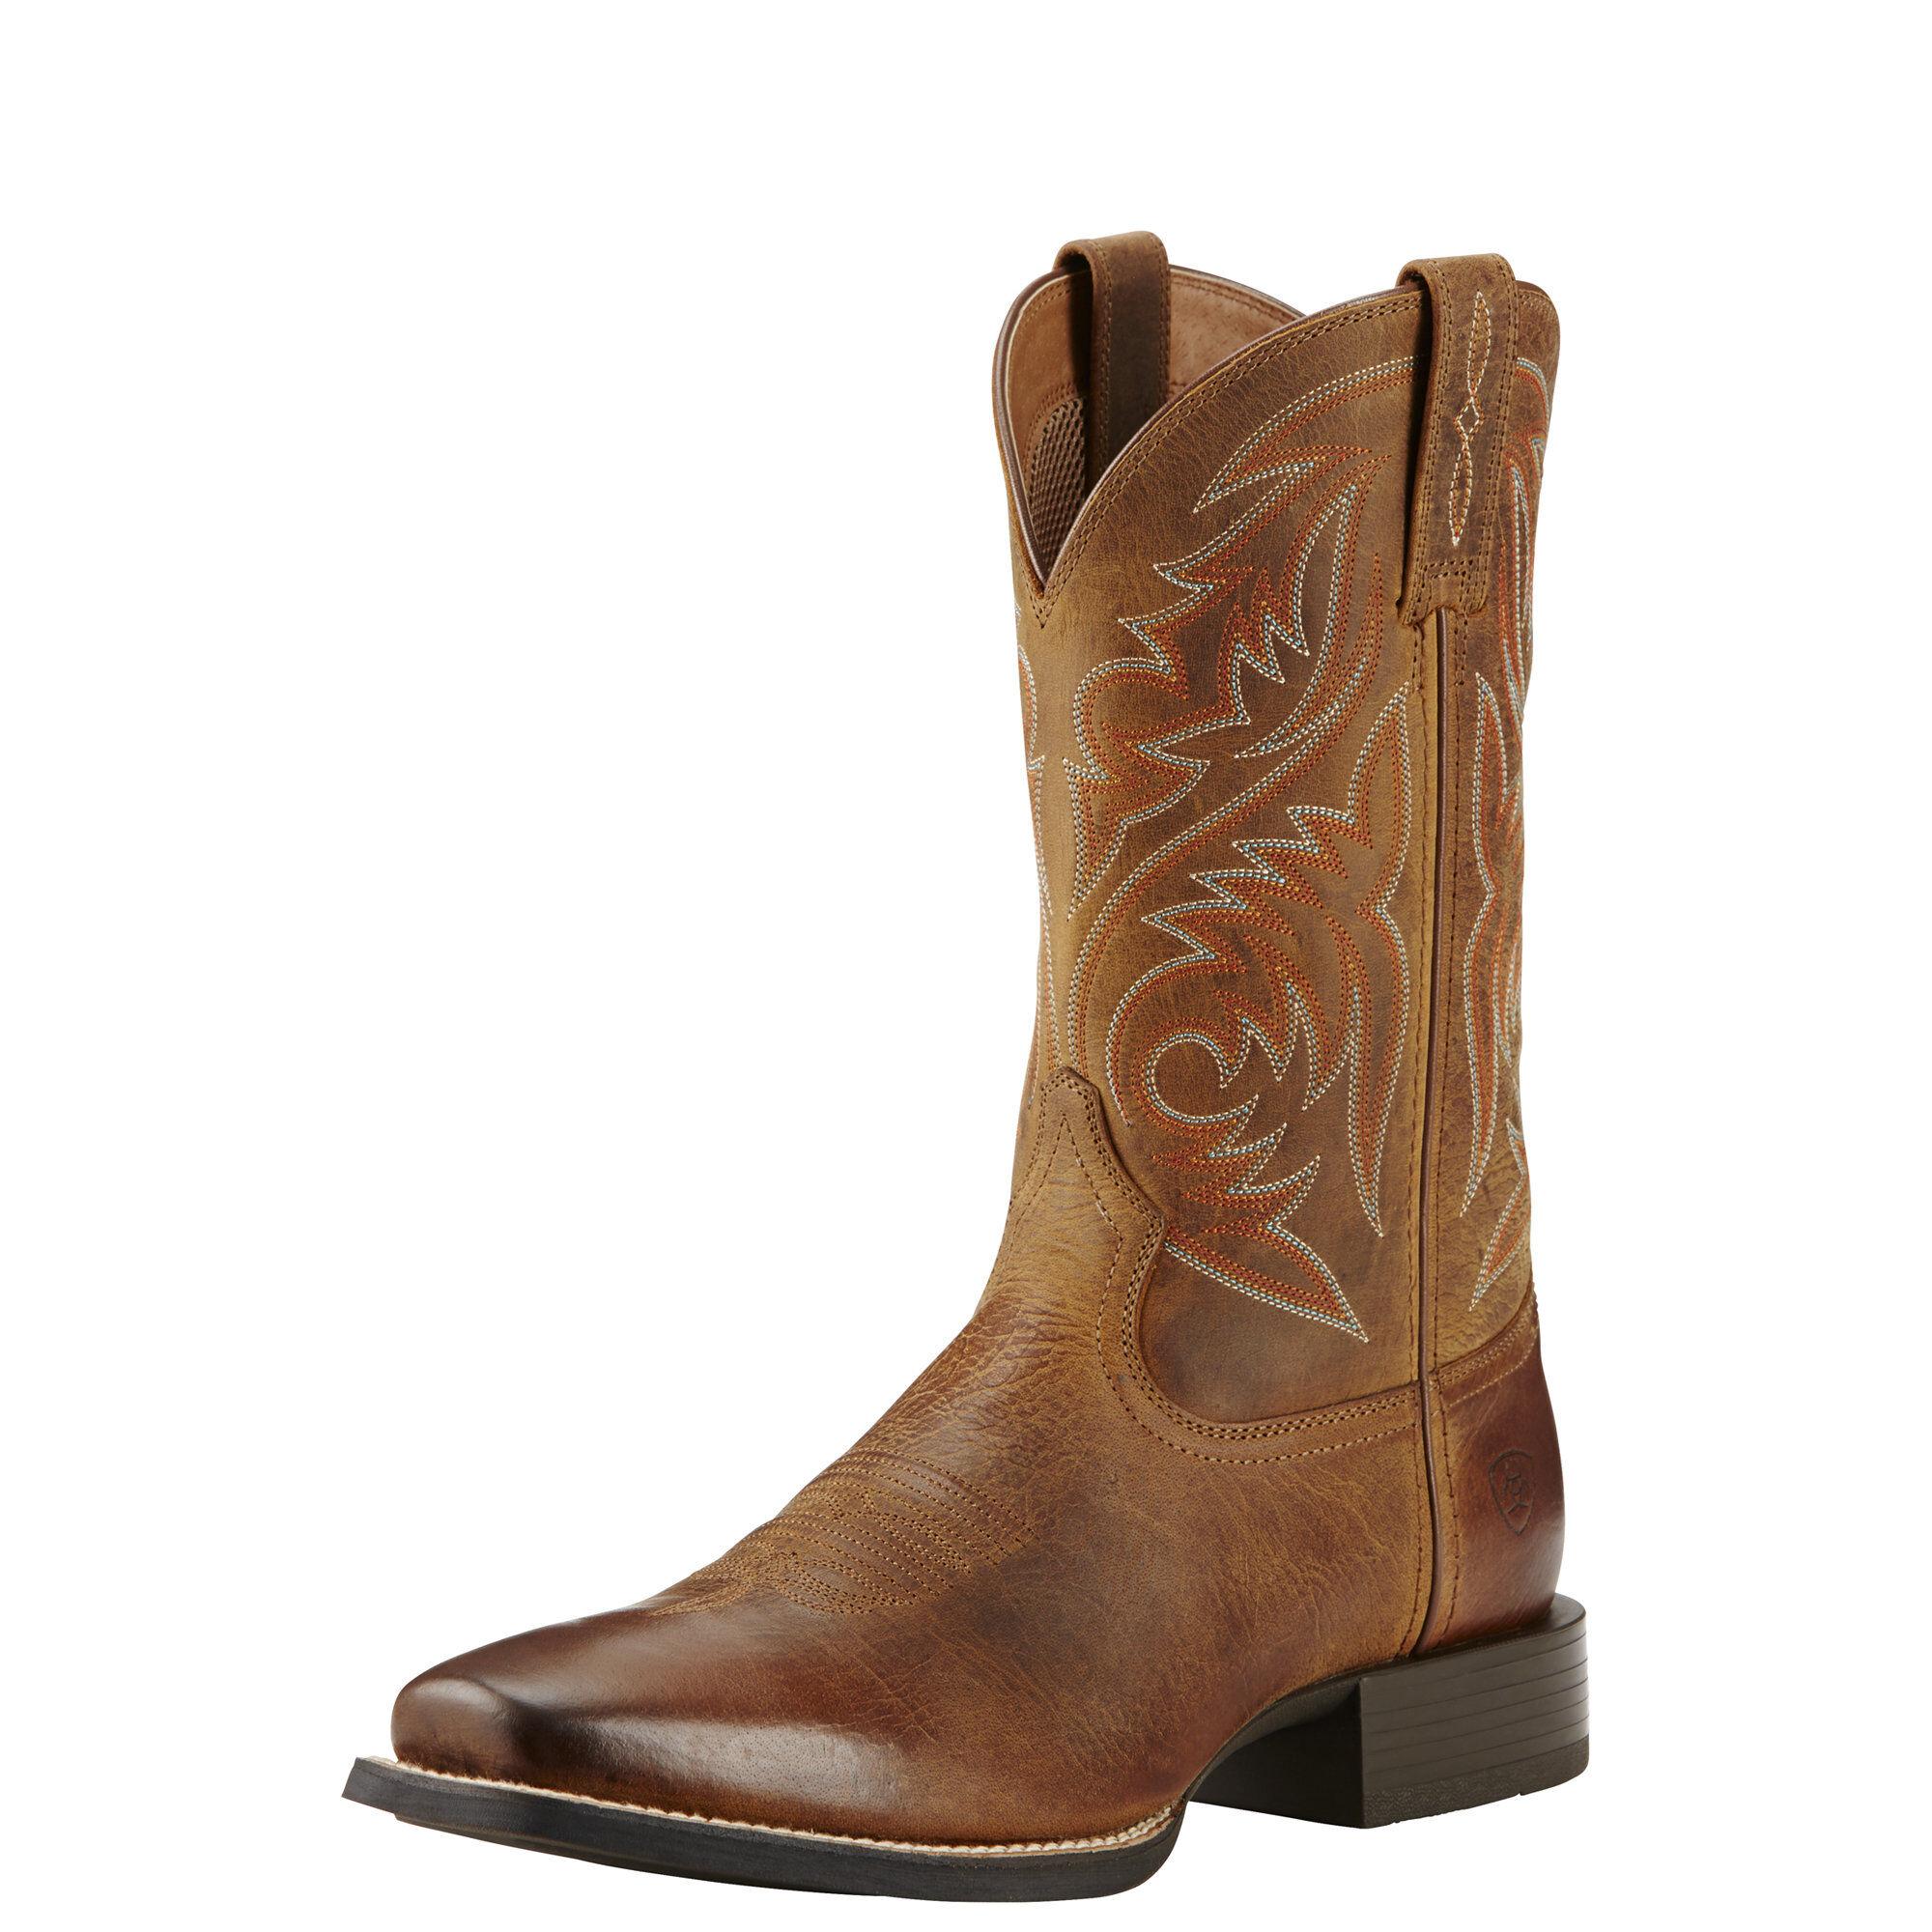 Men's Ariat Sport Herdsman Cowboy Boot, Size: 7.5 D, Powder Brown Full Grain Leather